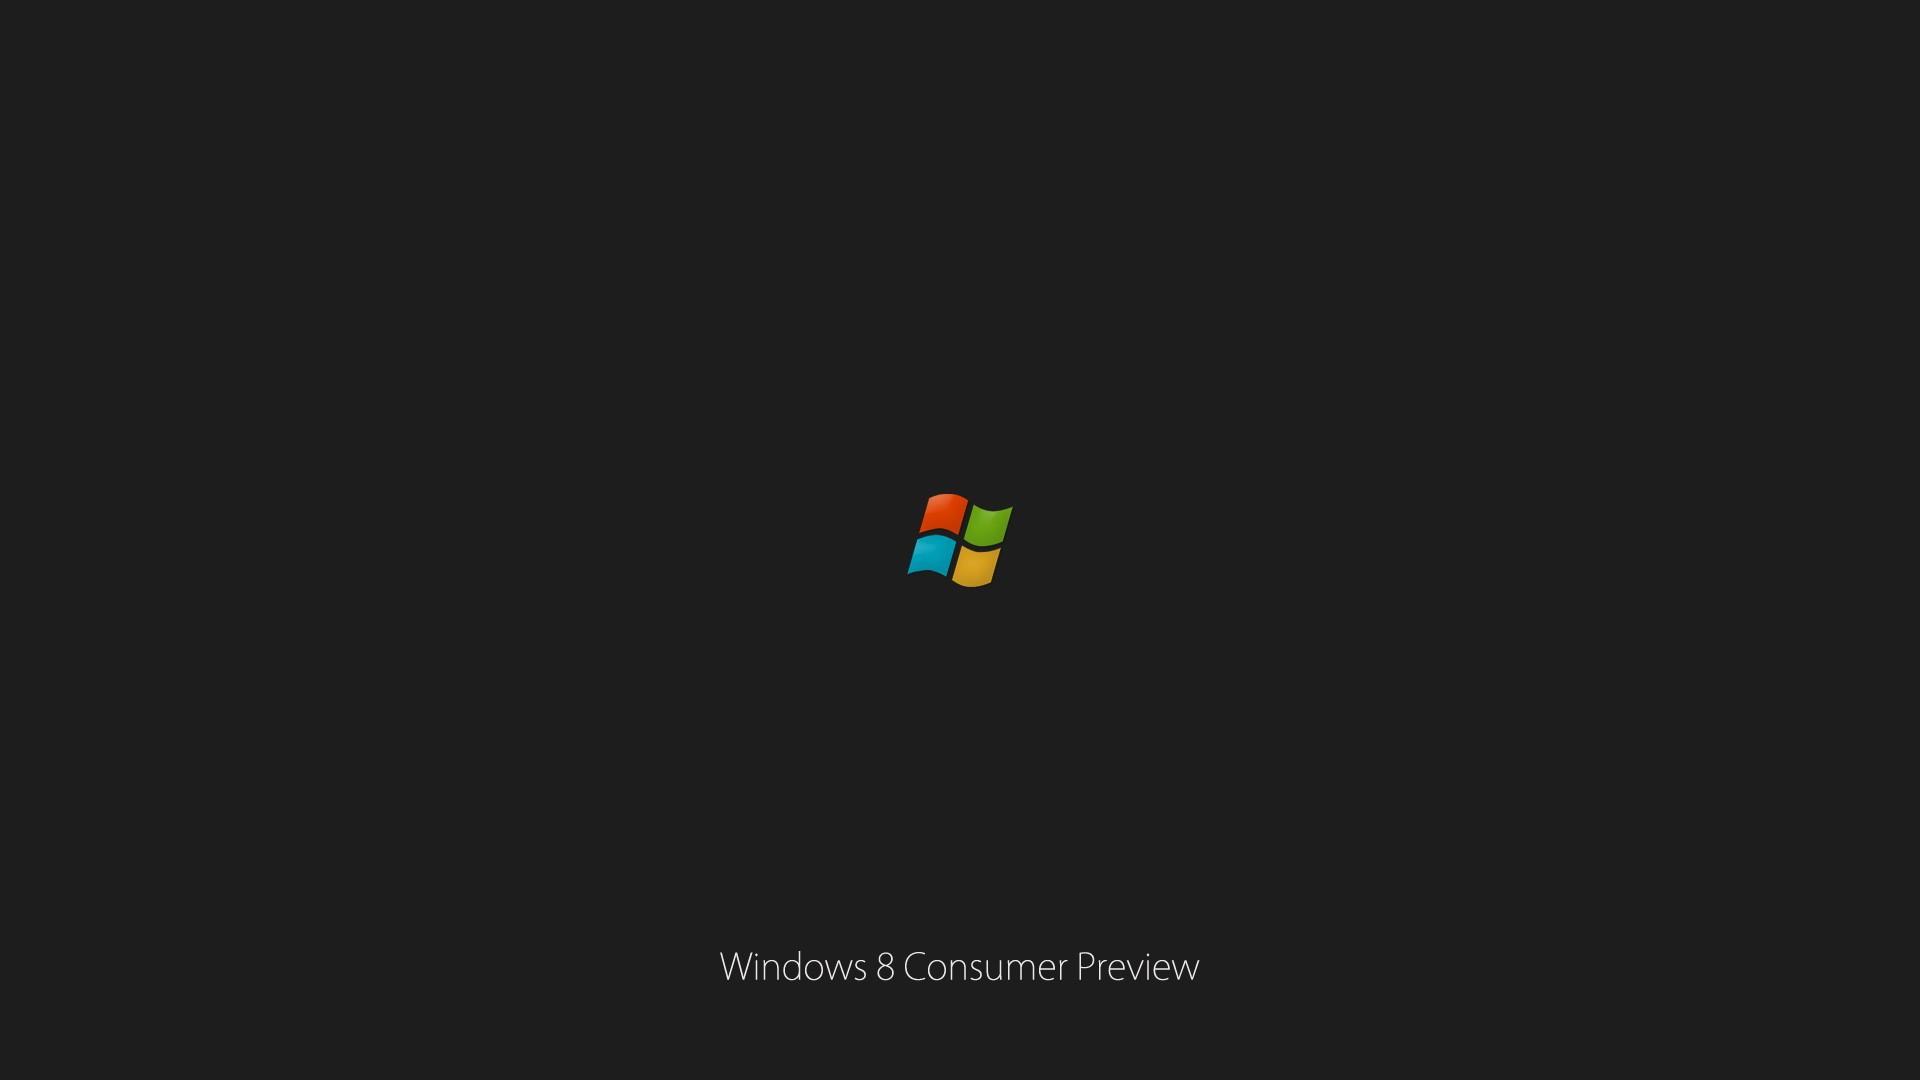 Windows 10 Logo Wallpaper 1920x1080